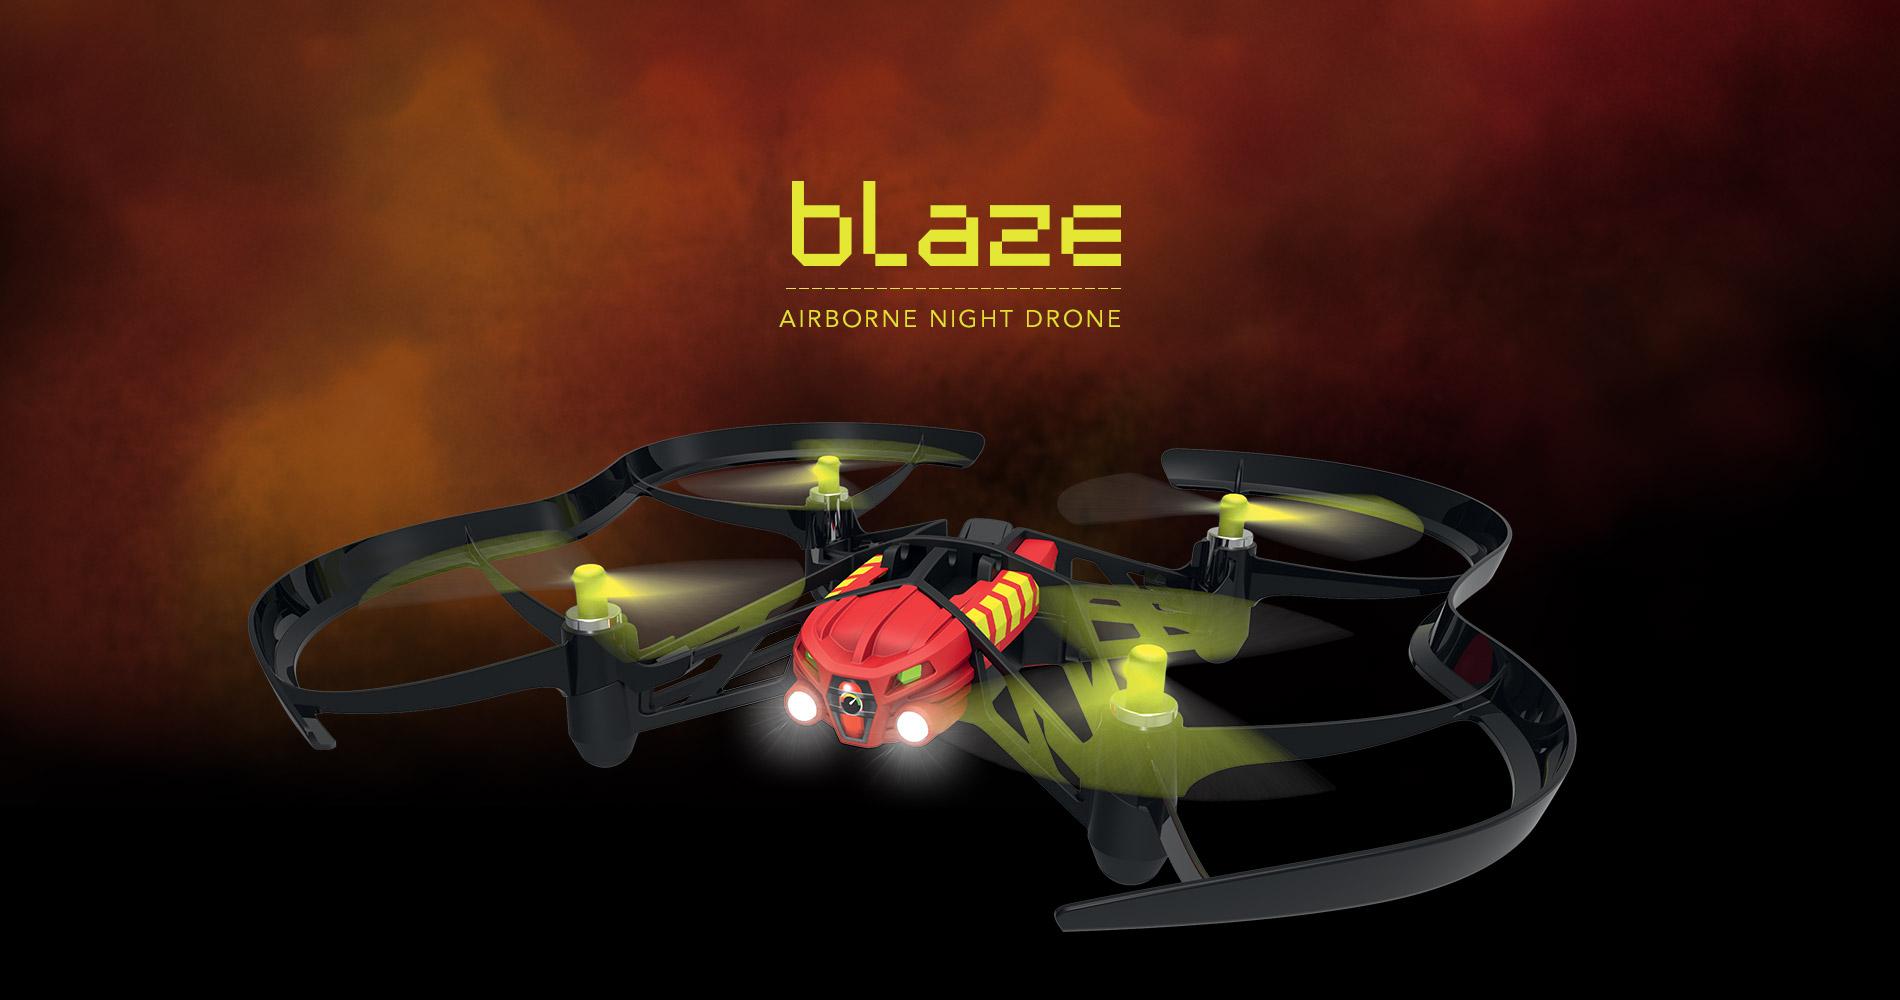 Parrot Airborne Night Drone Blaze en droneprix.es